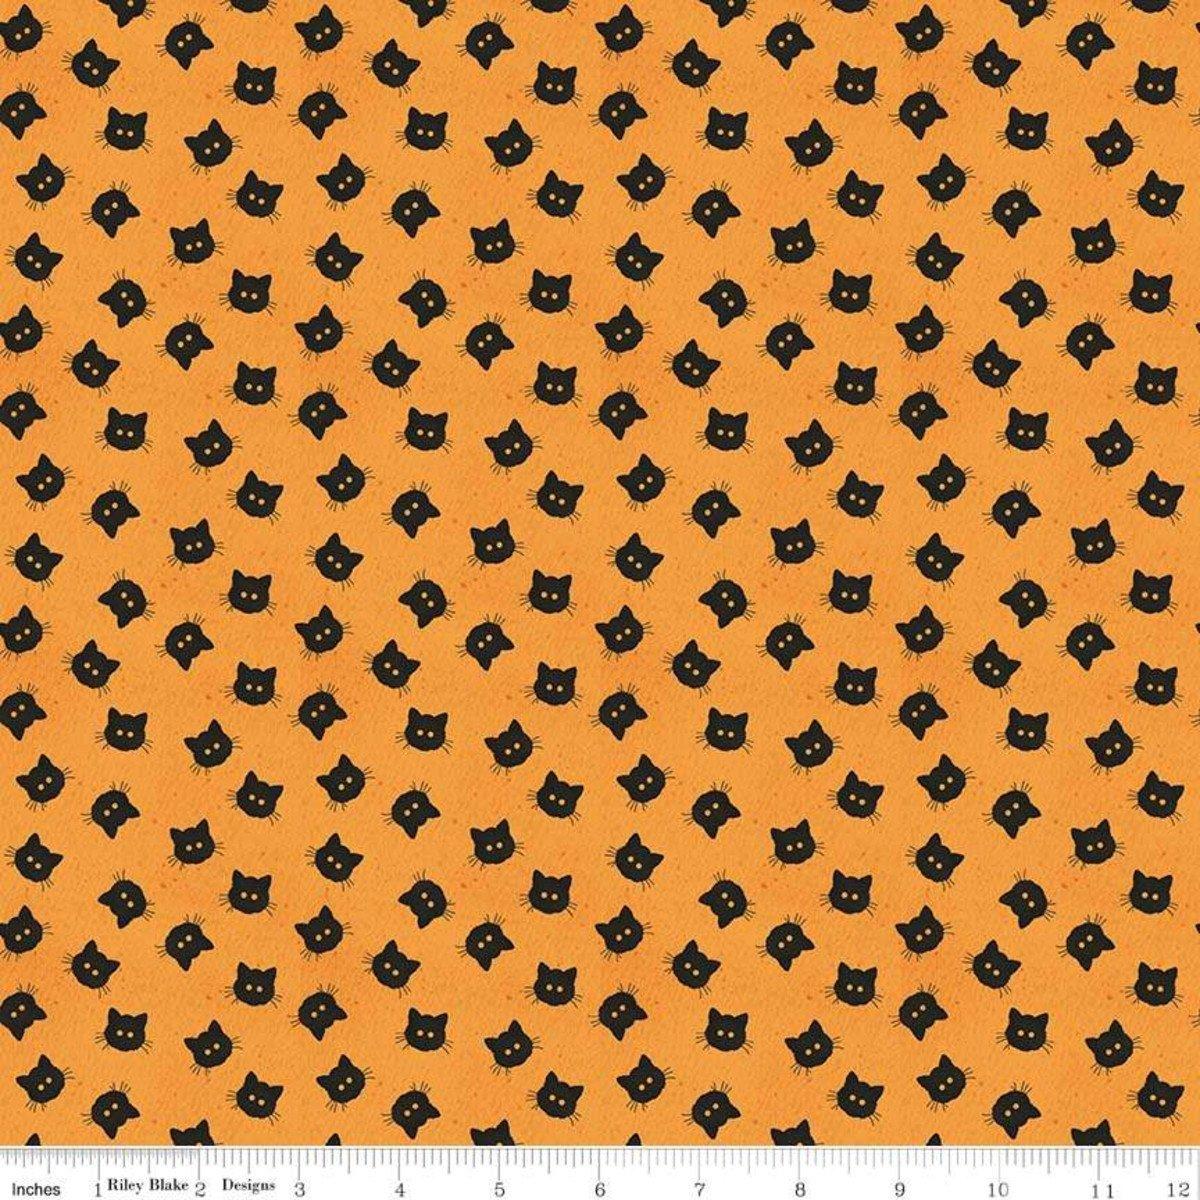 C8367-ORANGE_Scaredy Cat Buttons Costume Maker's Ball